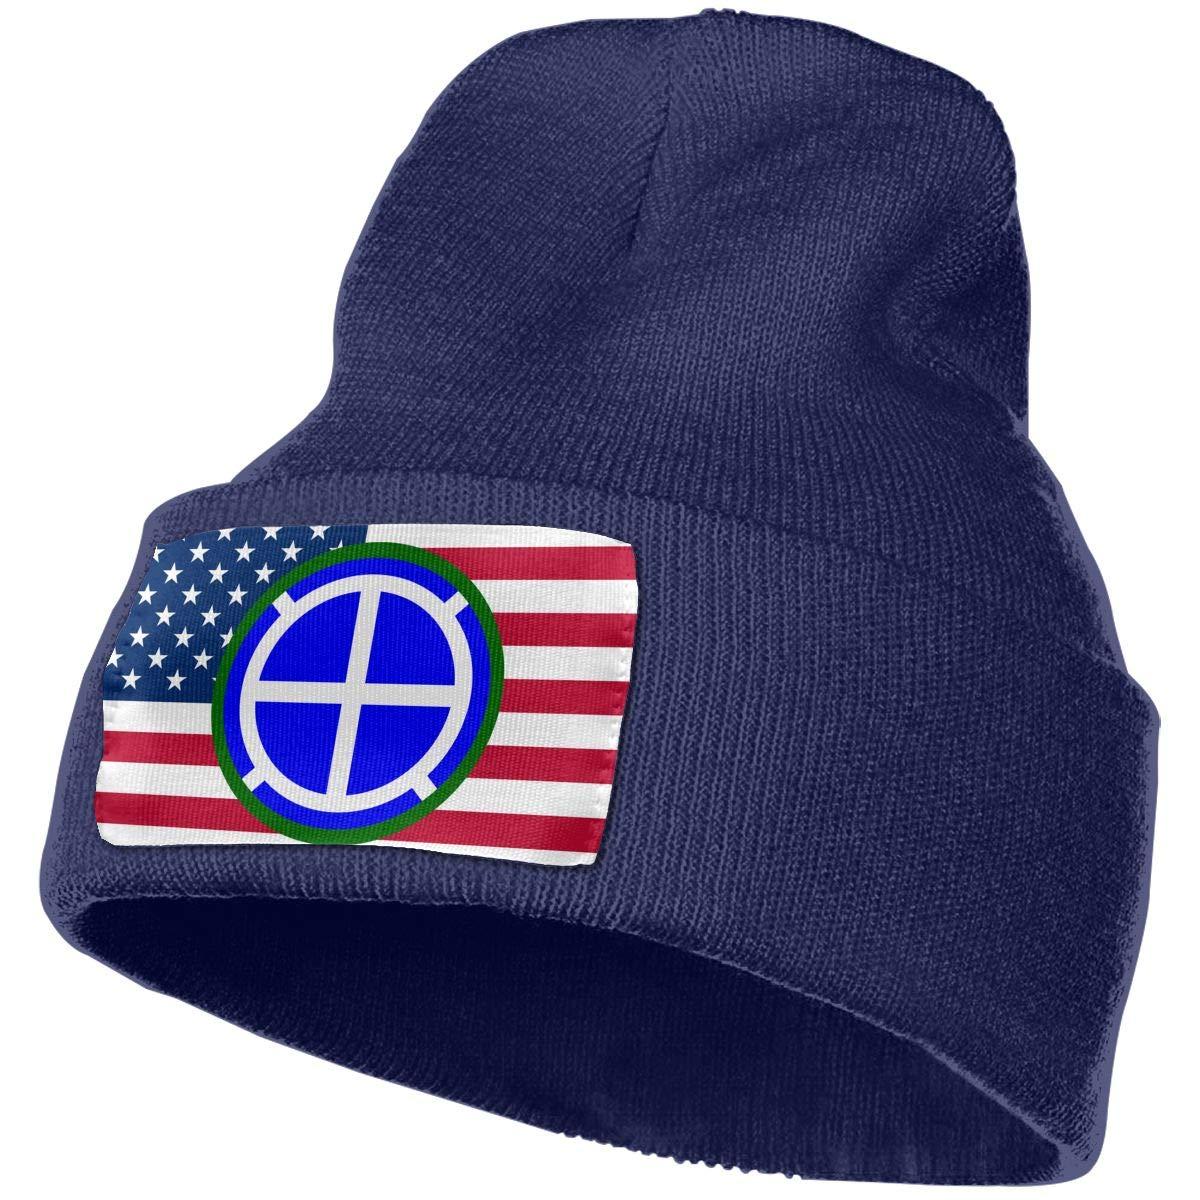 35th Infantry Division Men/&Women Warm Winter Knit Plain Beanie Hat Skull Cap Acrylic Knit Cuff Hat